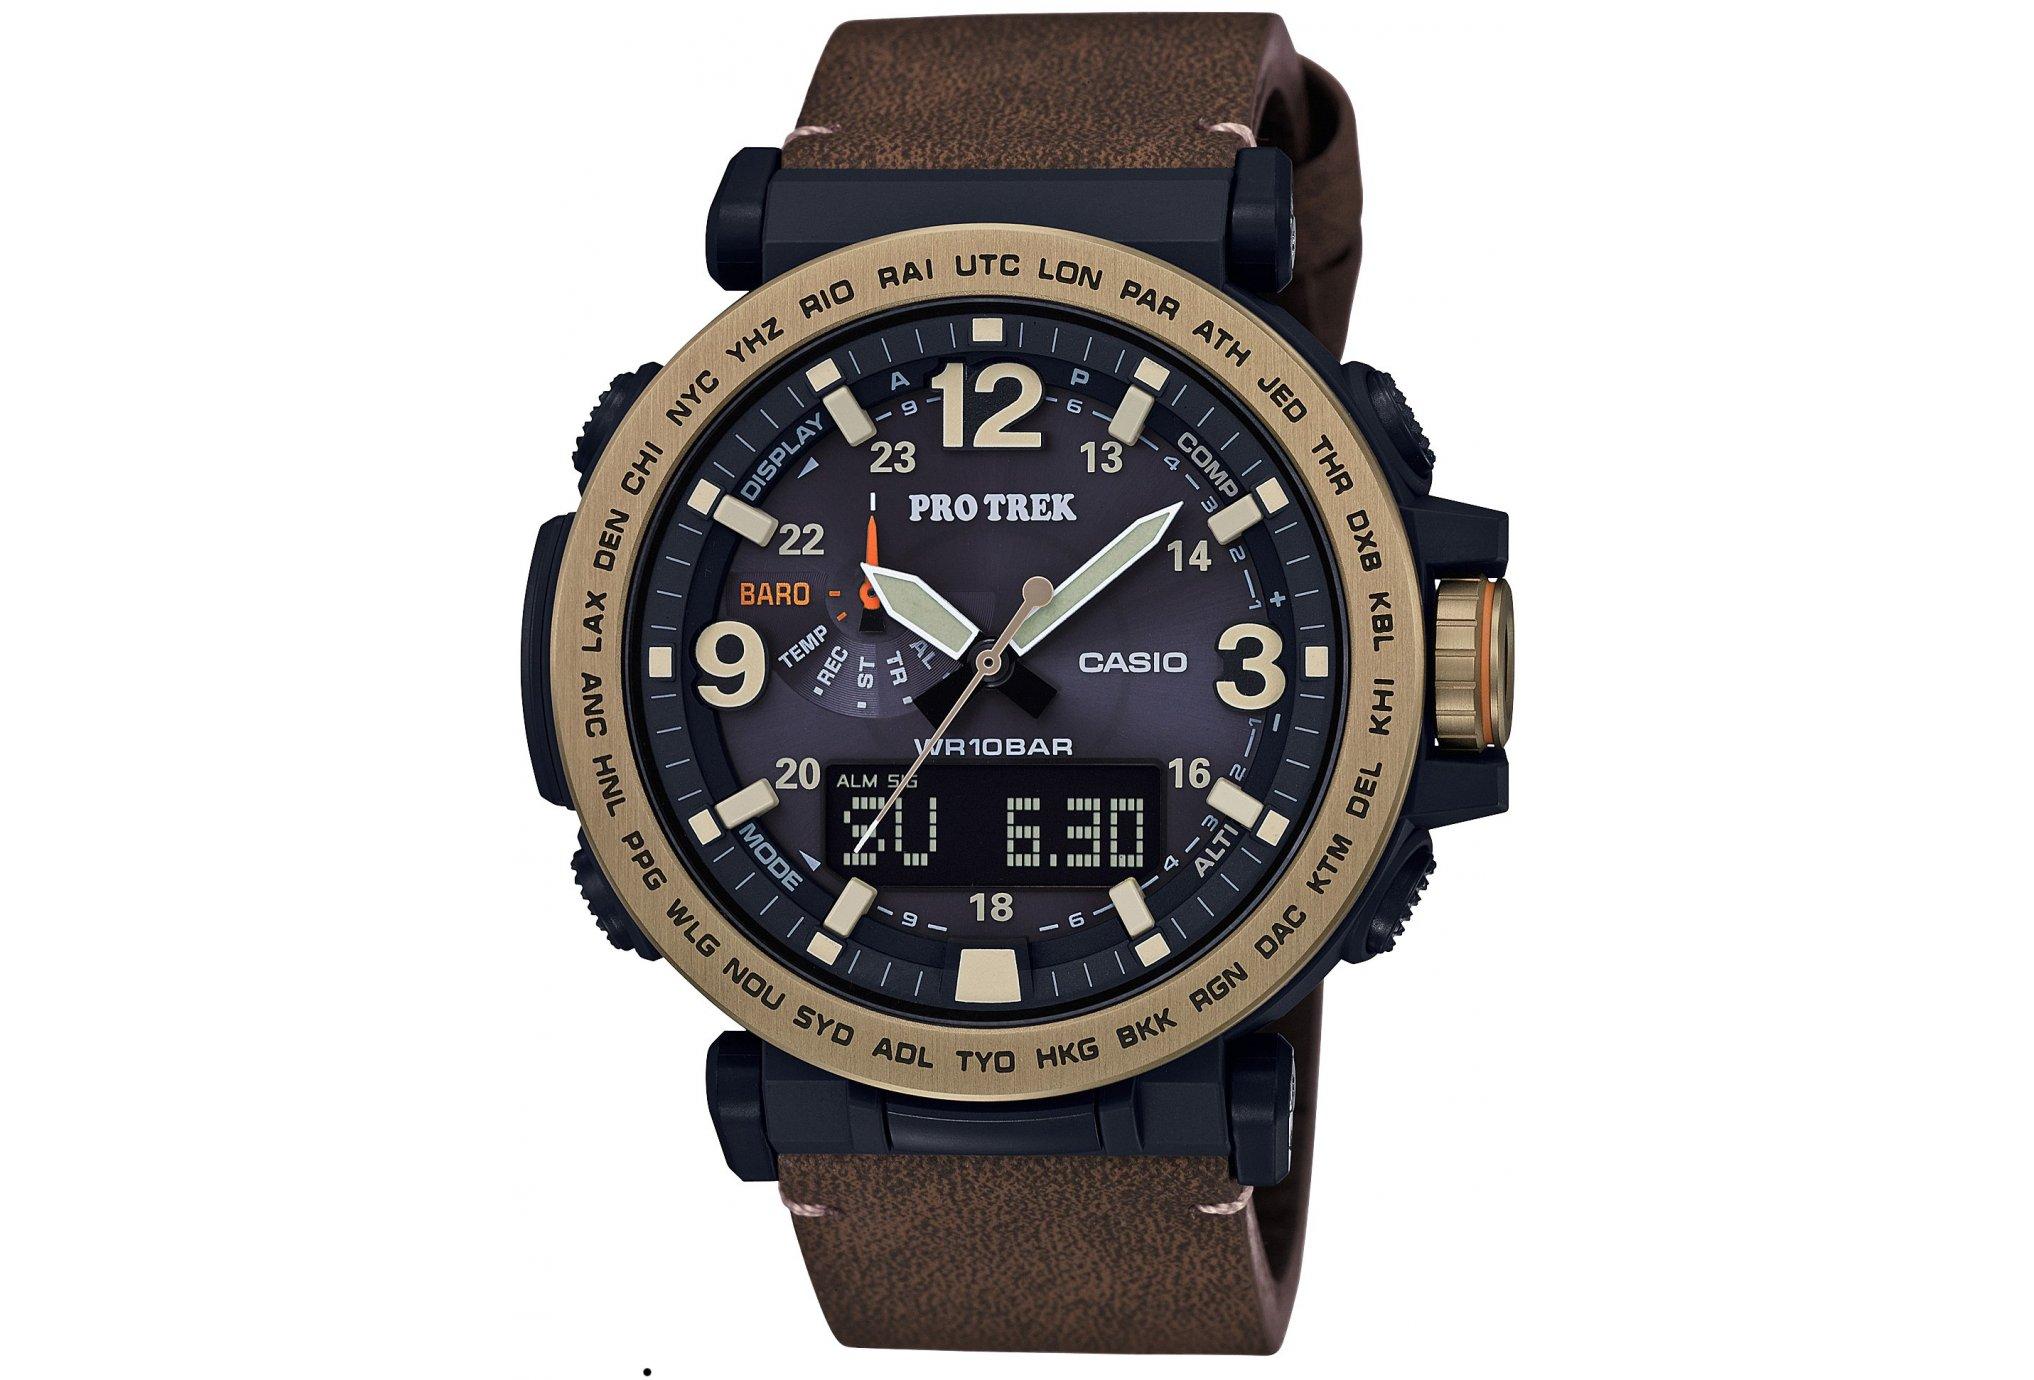 Casio Prg-600yl montres de sport